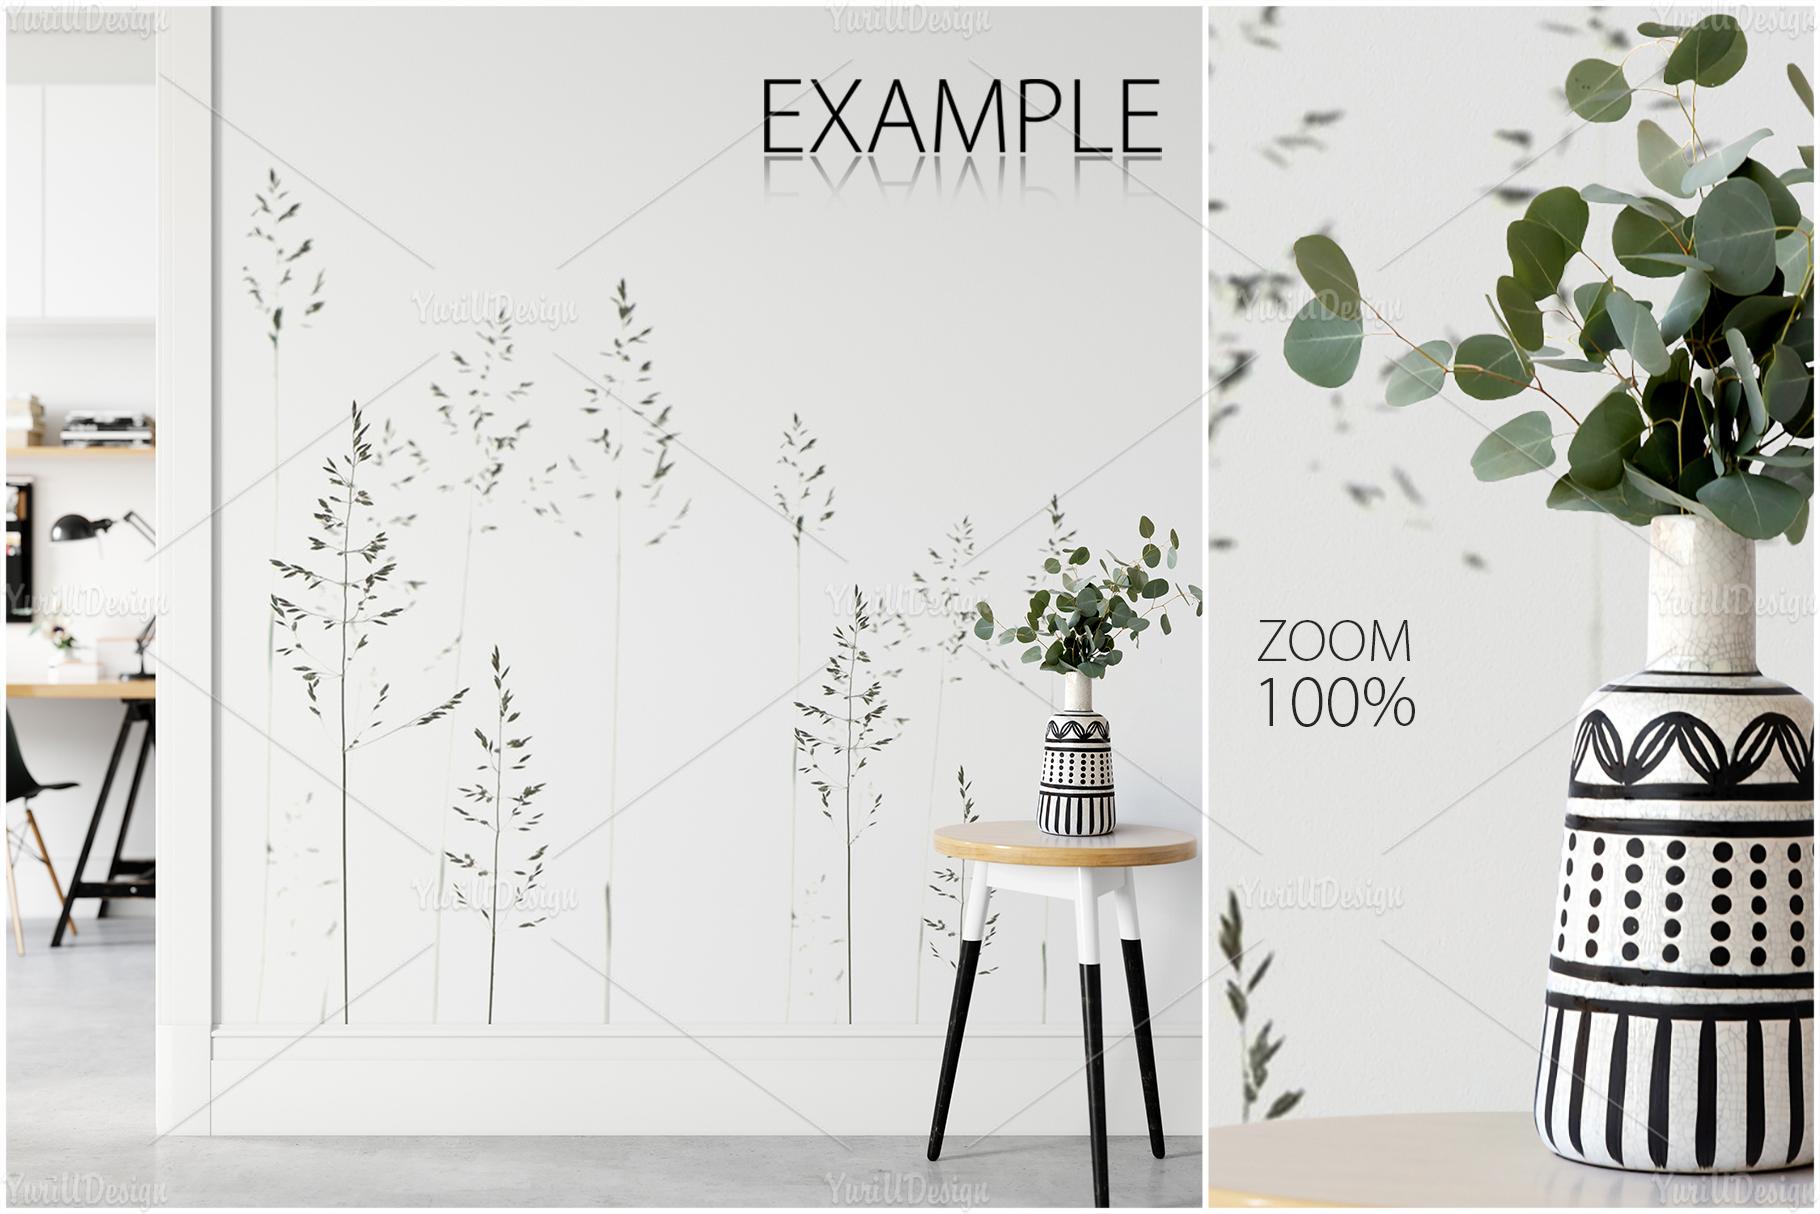 Scandinavian Interior Frames & Walls Mockup Bundle - 3 example image 16